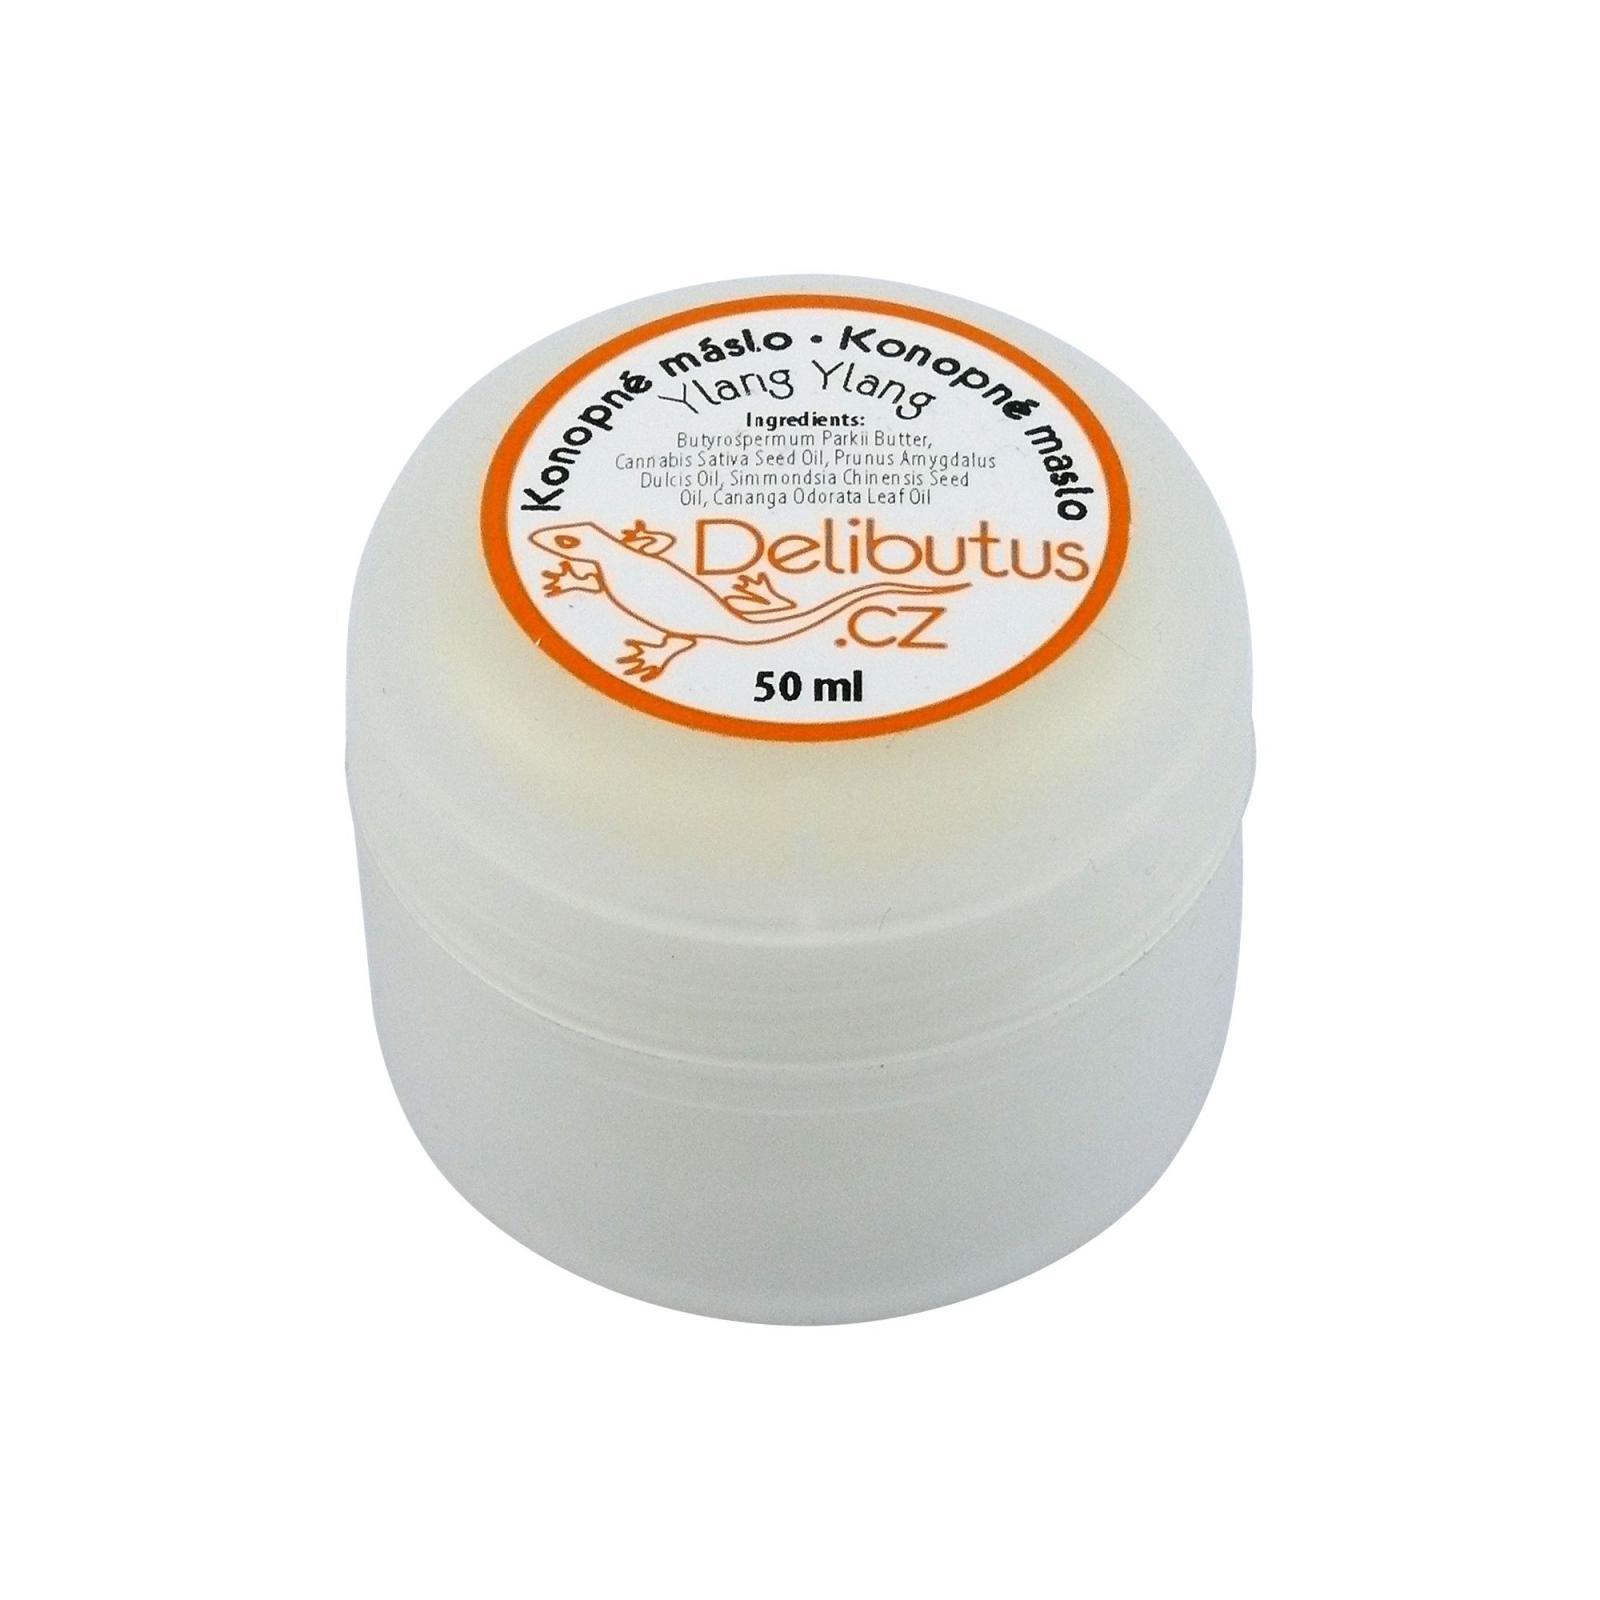 Delibutus Konopné máslo Ylang ylang 50 ml